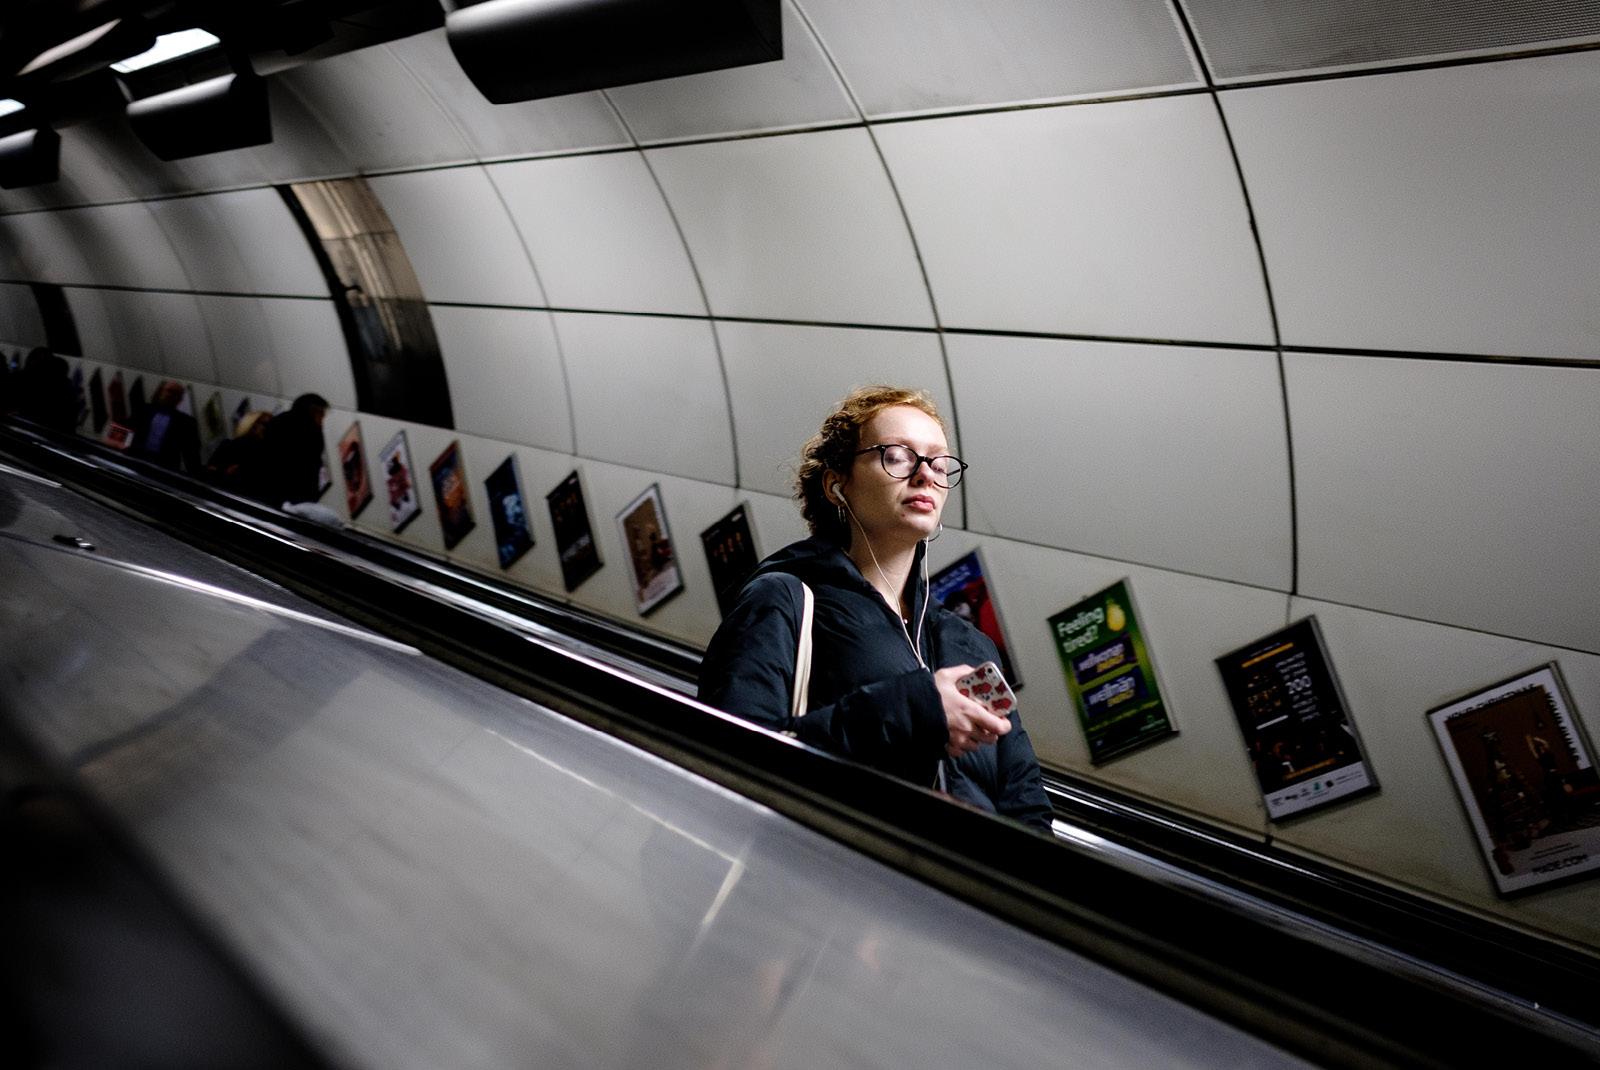 24-hours-on-the-london-underground-night-tube-street-photography-tarikahmet-underground-music